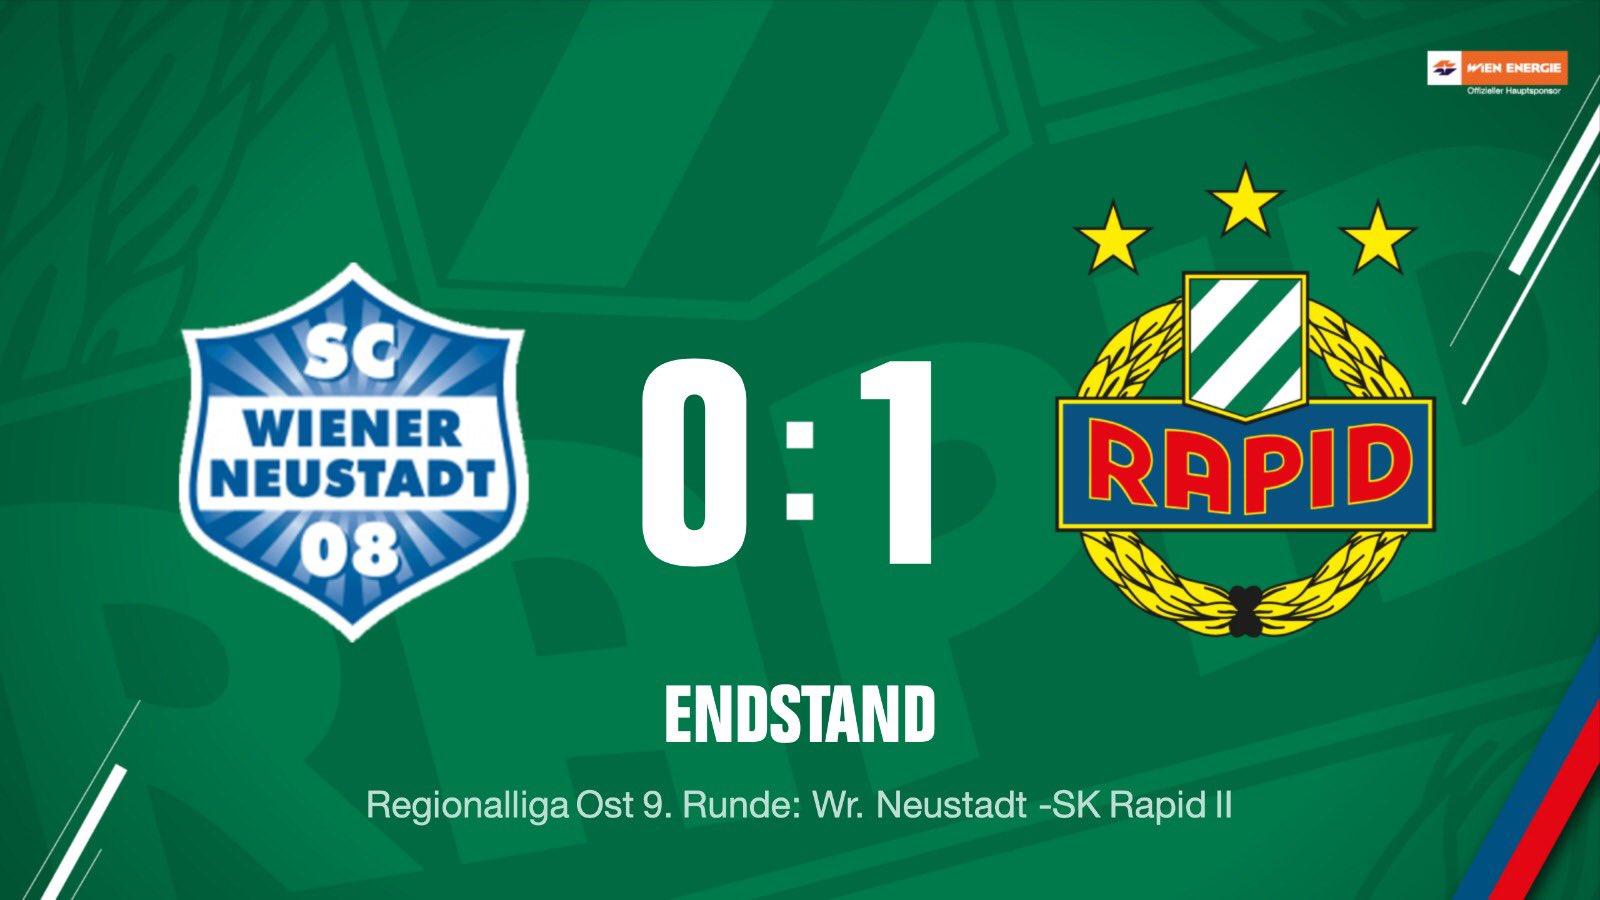 Sk Rapid On Twitter Ft Auswartssieg ℹ Sc Wr Neustadt 0 1 Sk Rapidii Skrapidii Scr2019